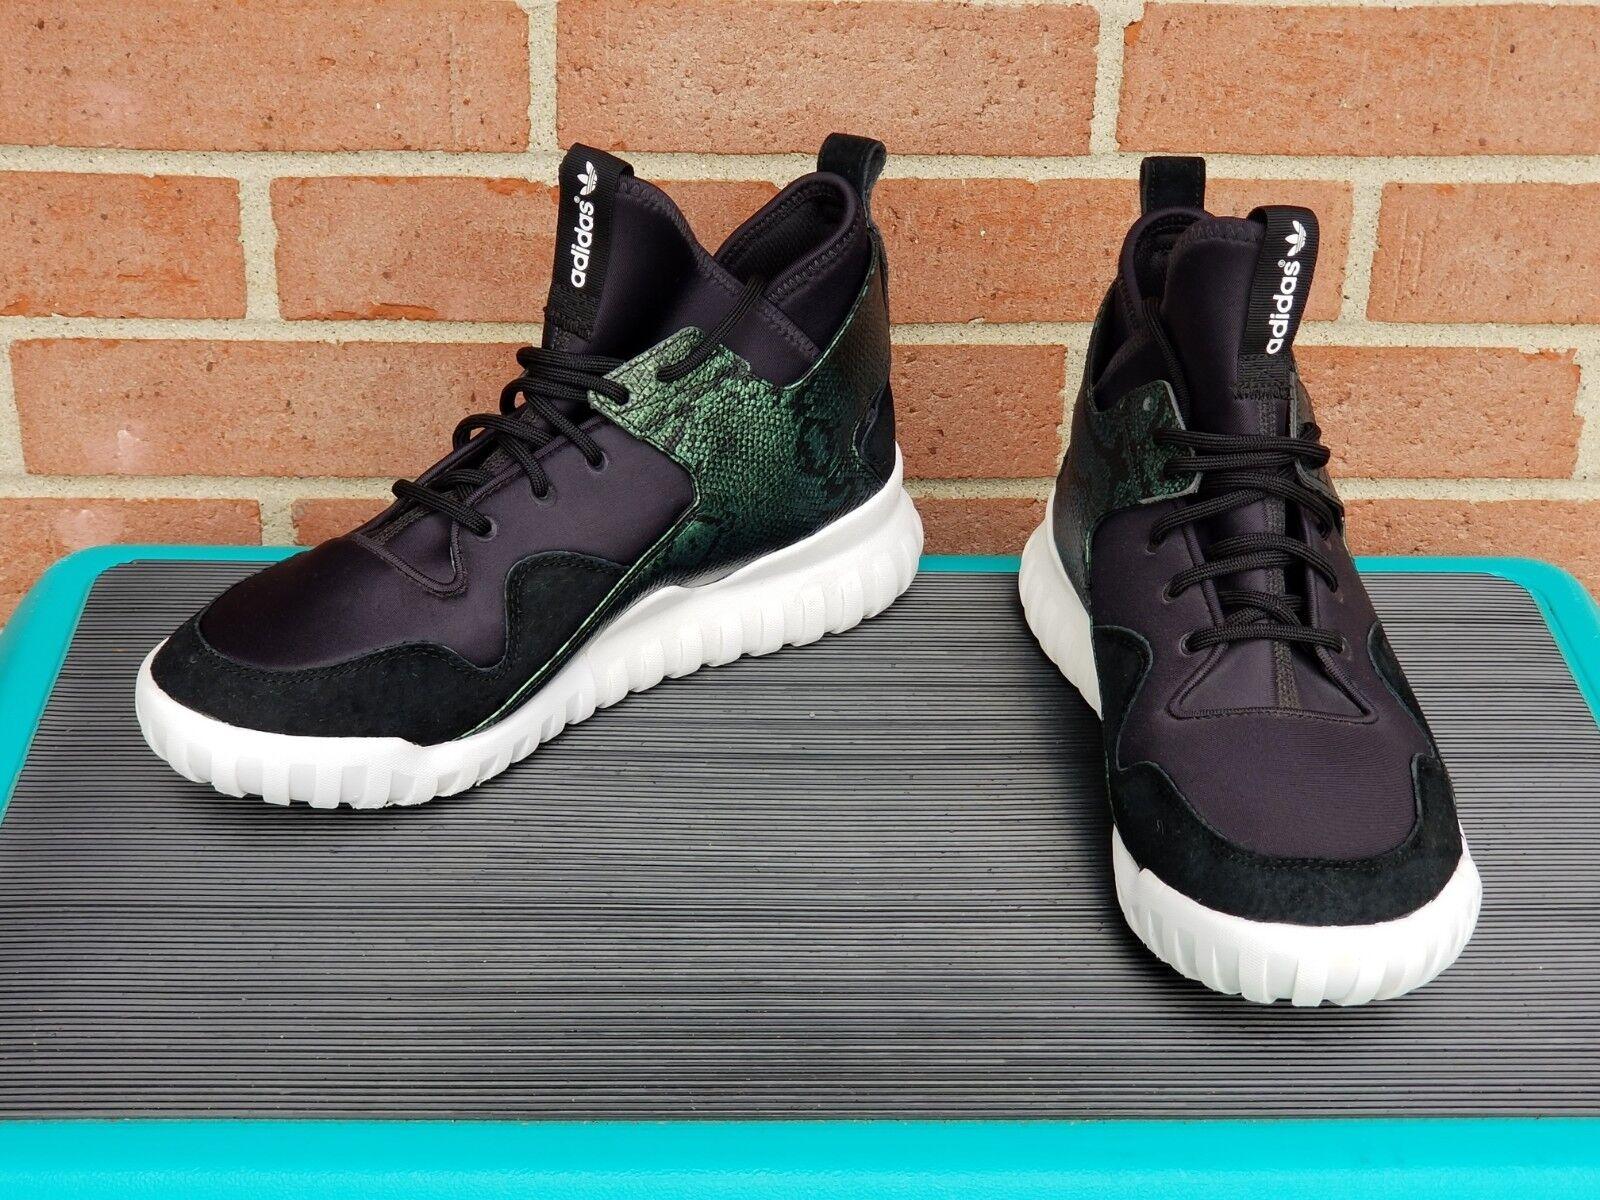 Adidas Originals Men's TUBULAR X Shoes Black/Green Animal Print S31988 Size 10